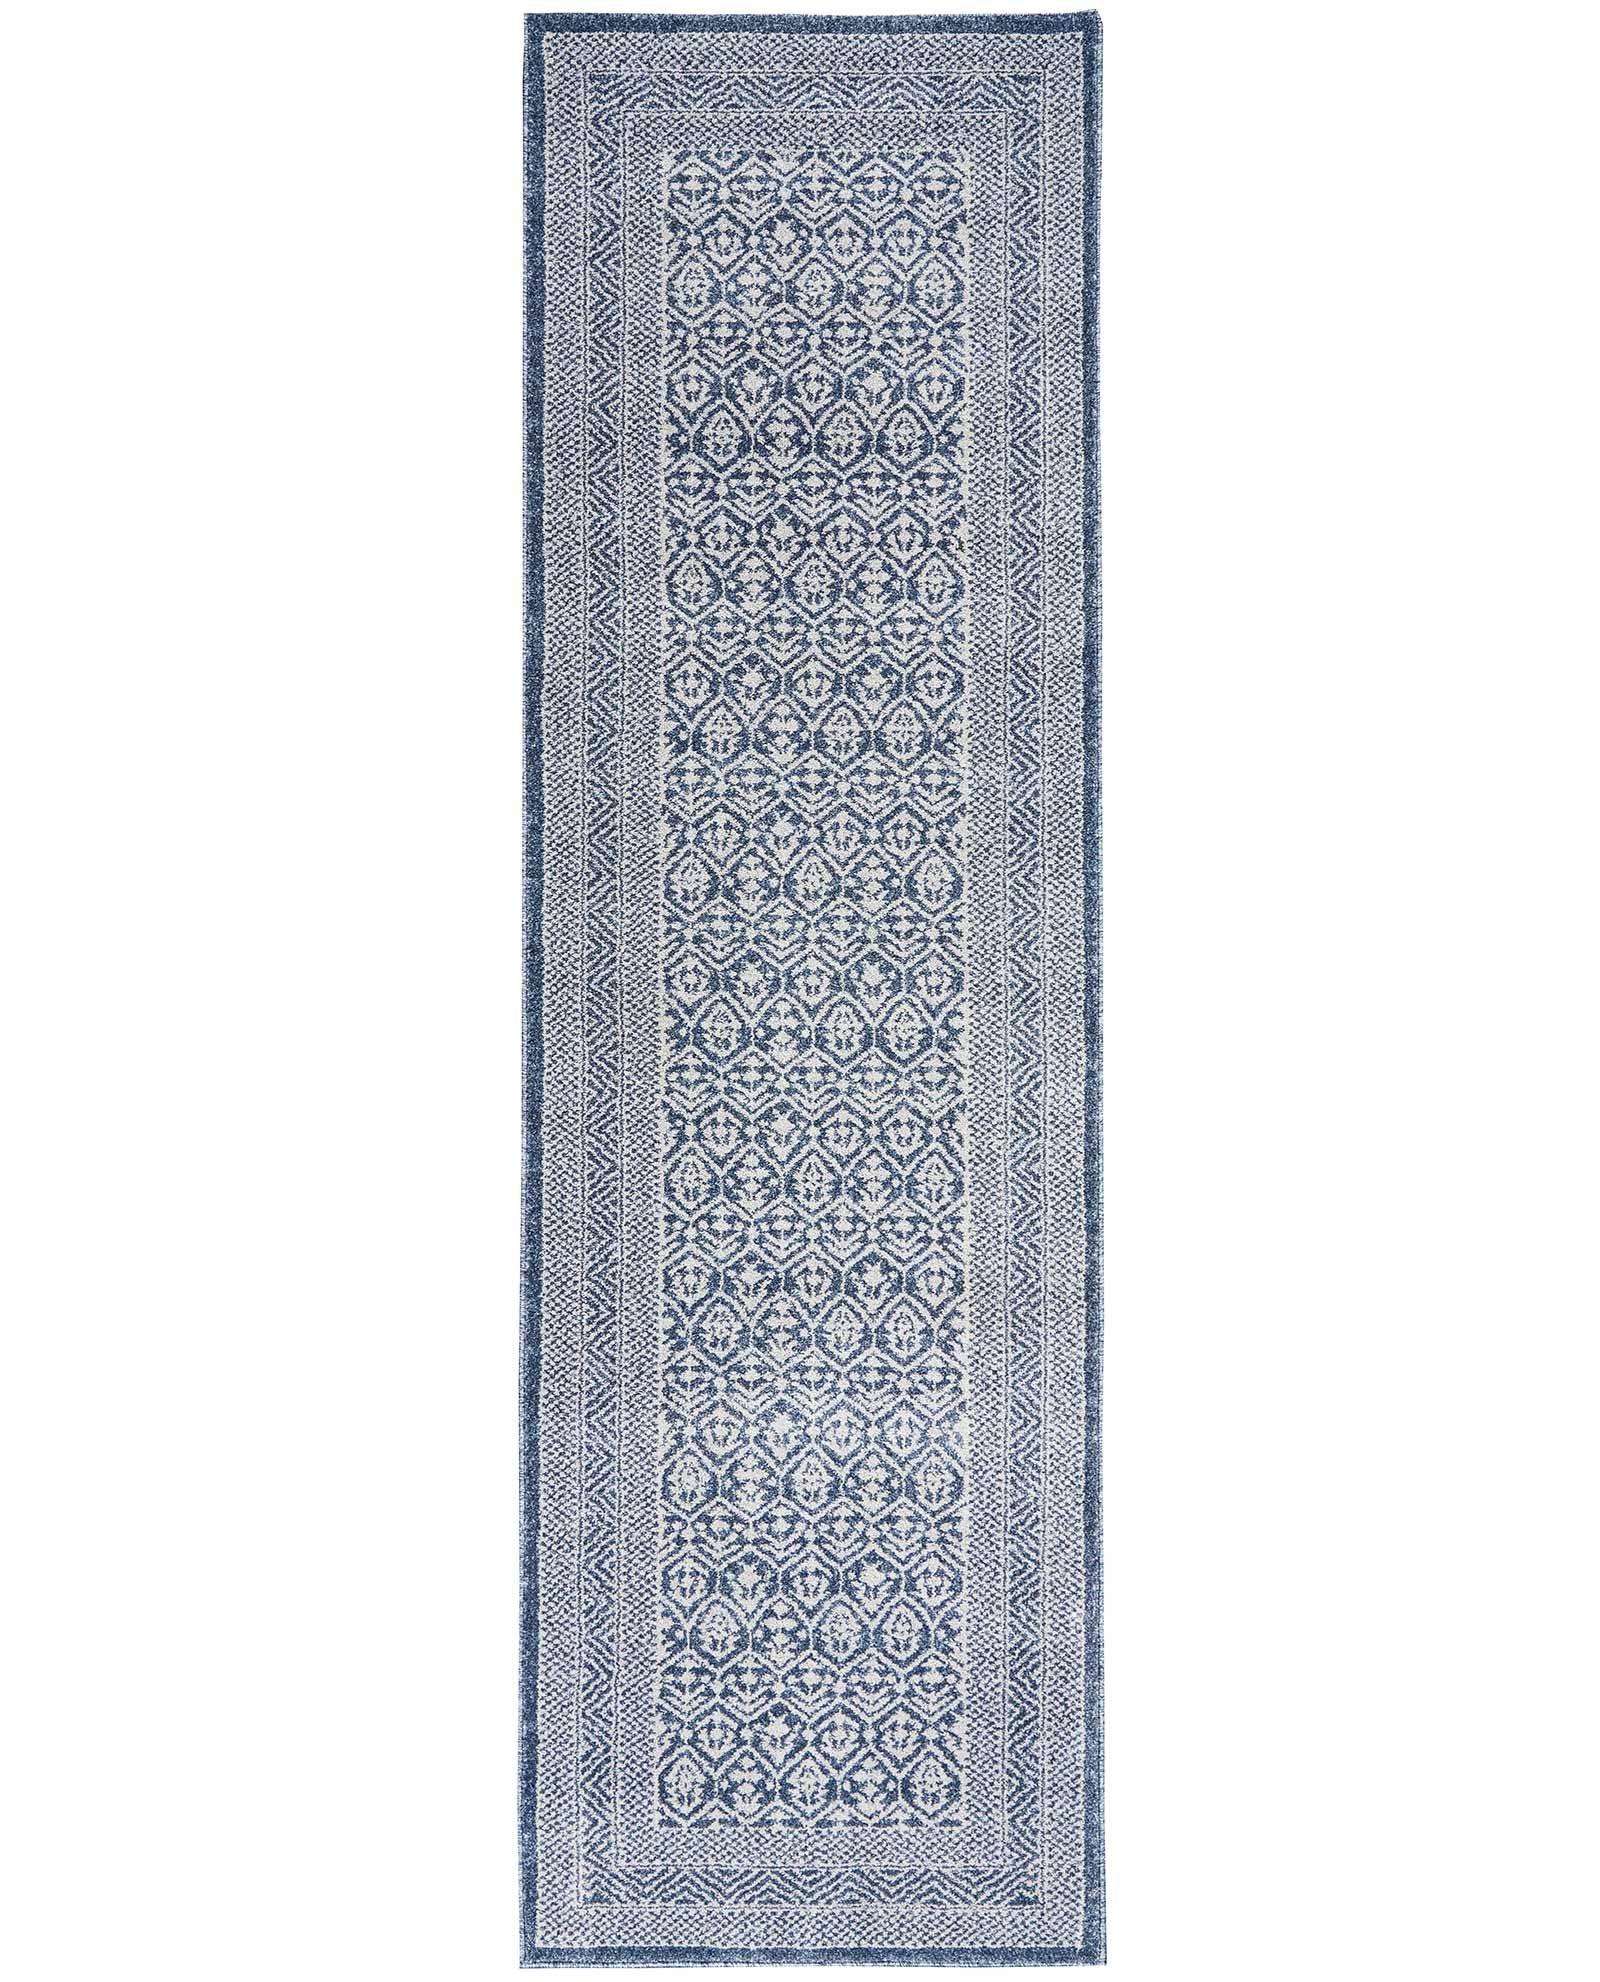 Nourison rug Palermo PMR01 BLUE GREY 2x8 099446719584 flat C